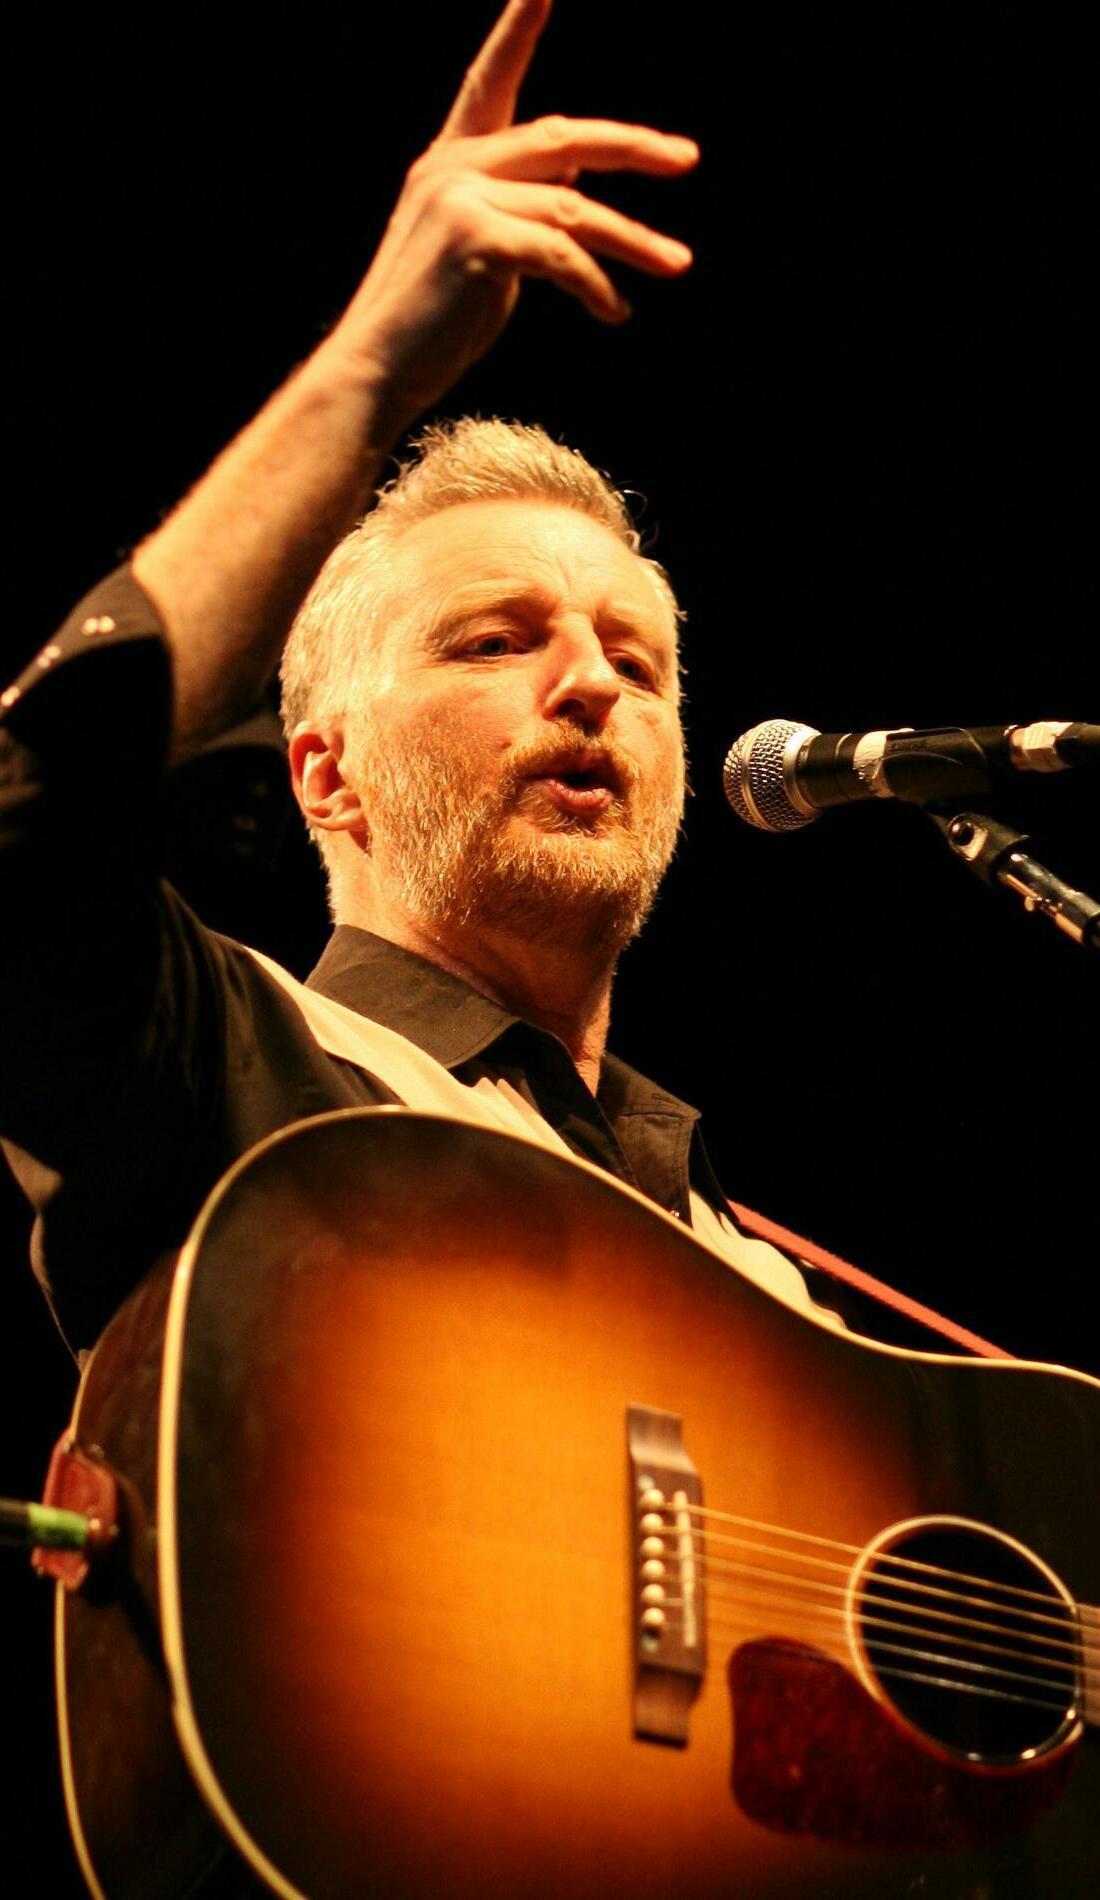 A Billy Bragg live event